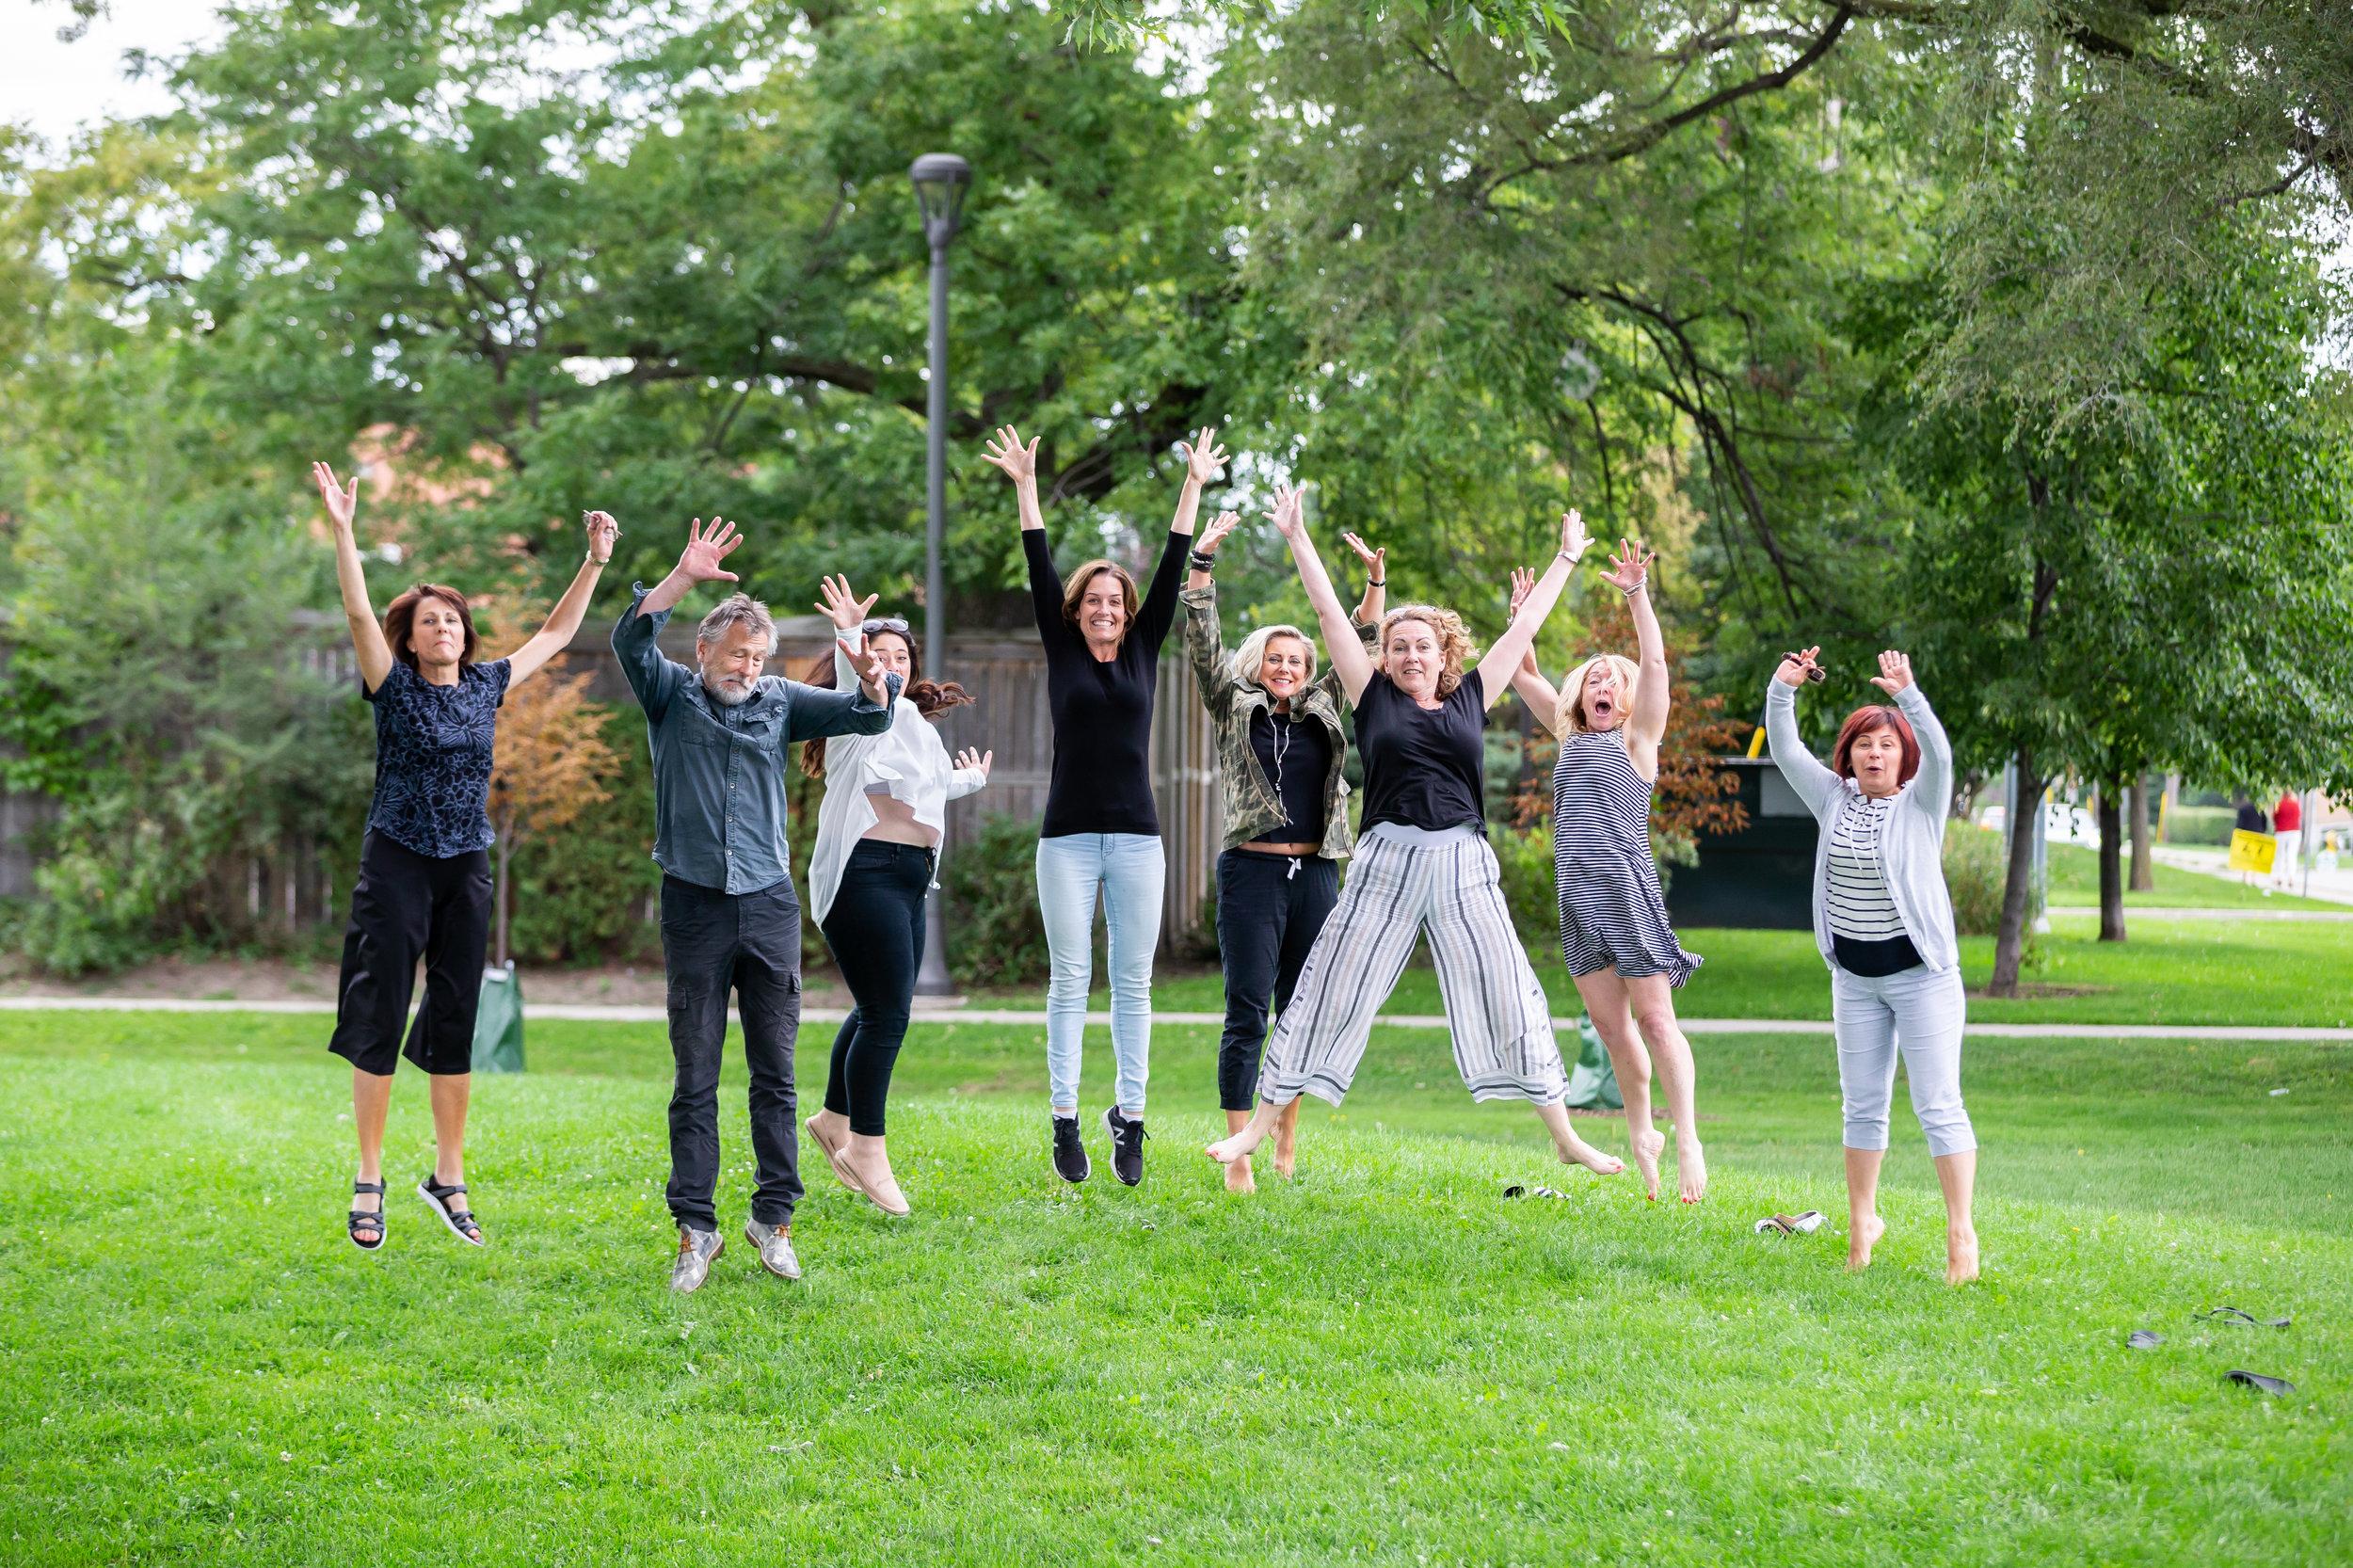 <p><strong>HIGH PARK GARDENS</strong>Meet the teachers of High Park Gardens Montessori School.<i><strong>Learn More →</strong></i></p>